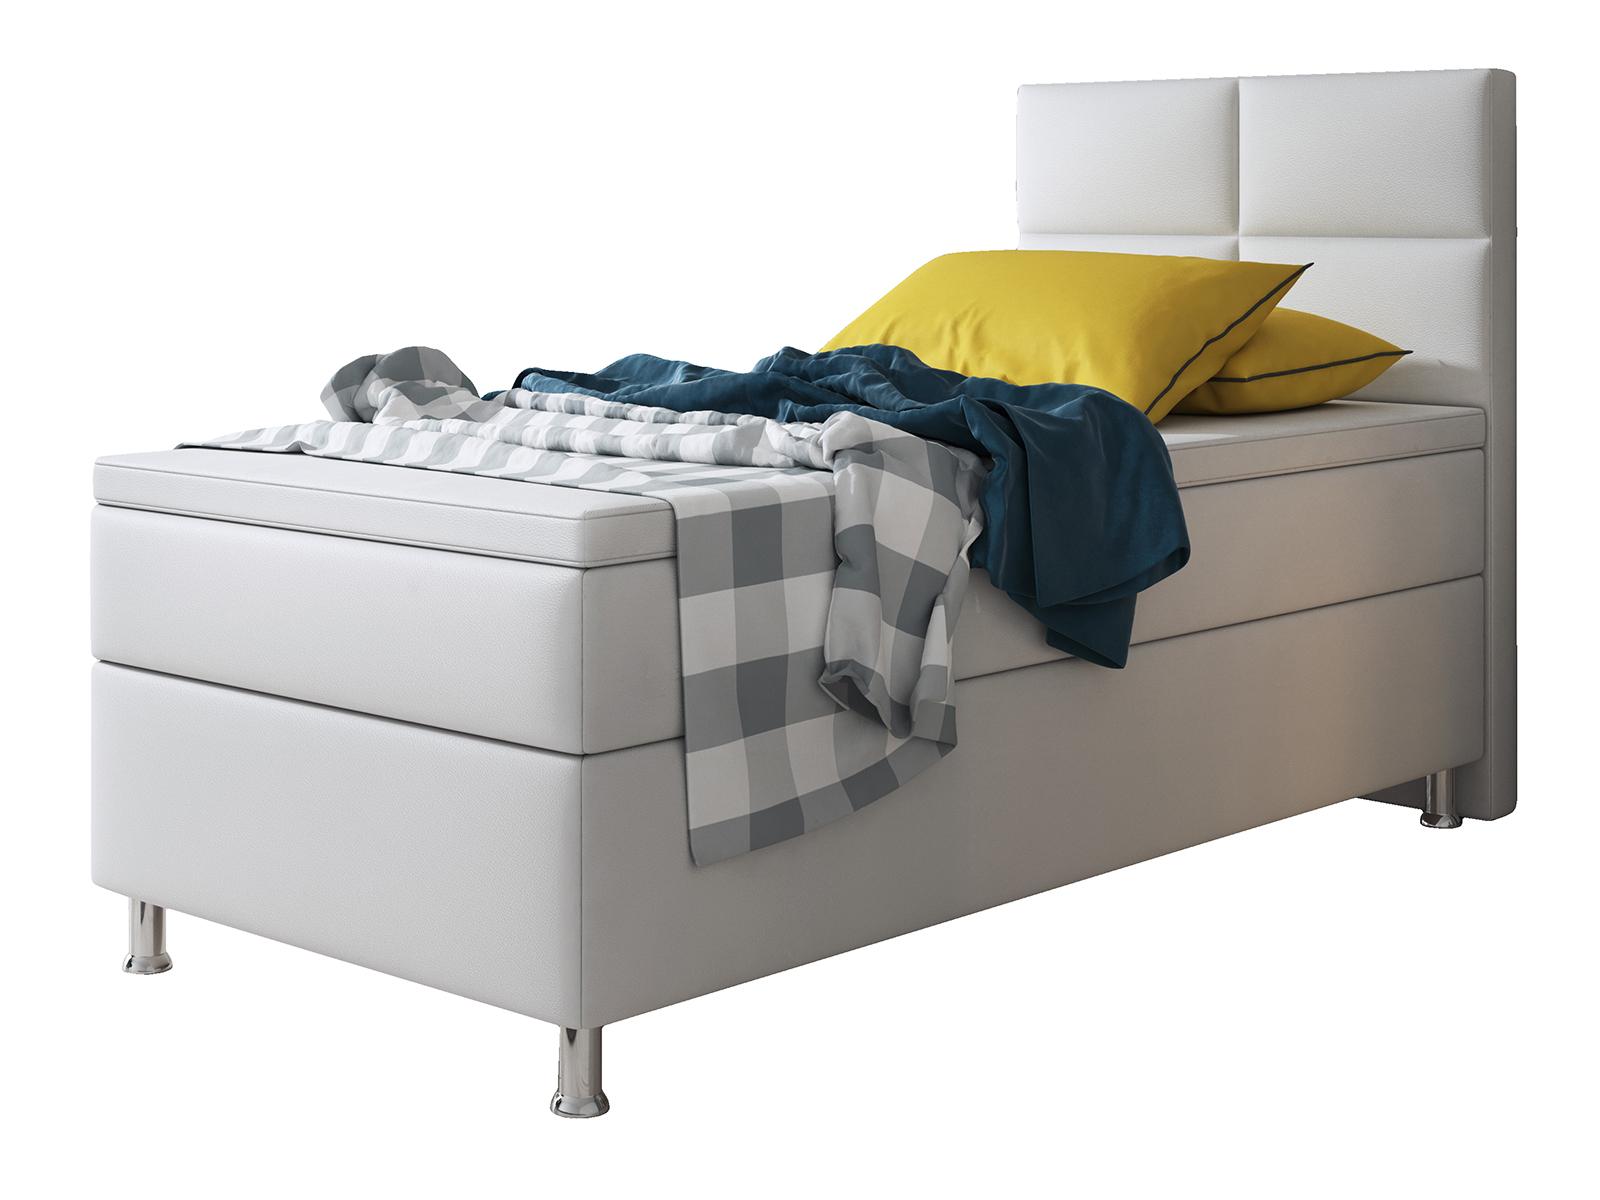 boxspringbett 90 200 wei kerryskritters. Black Bedroom Furniture Sets. Home Design Ideas